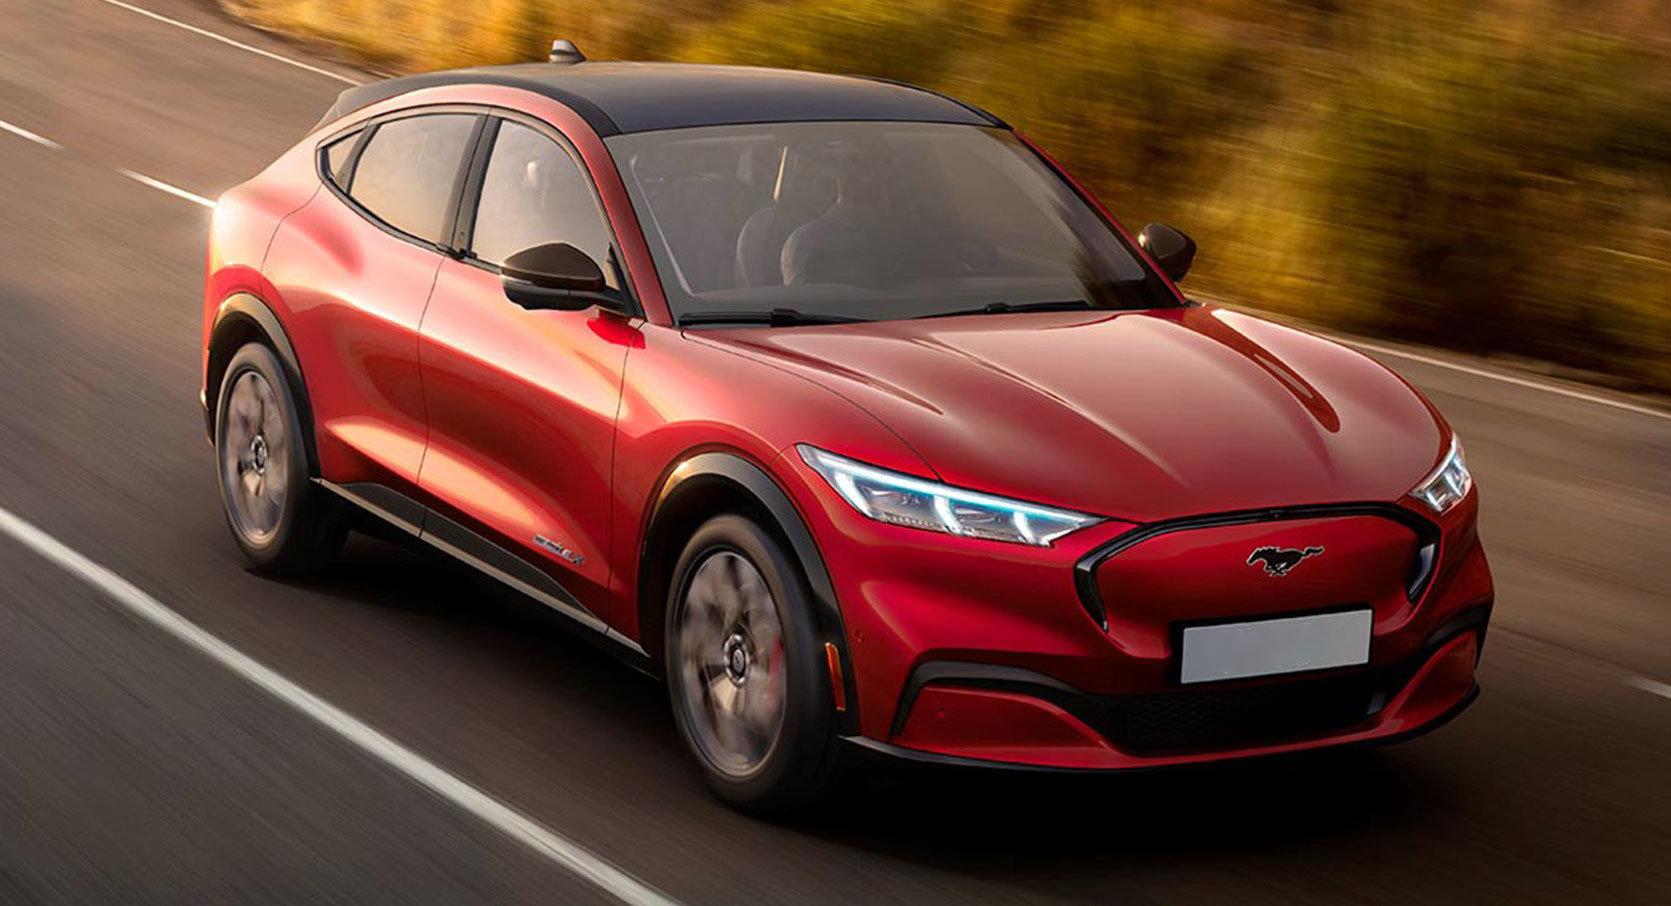 Ford собрал более 45 000 заказов на электрический Mustang Mach-E